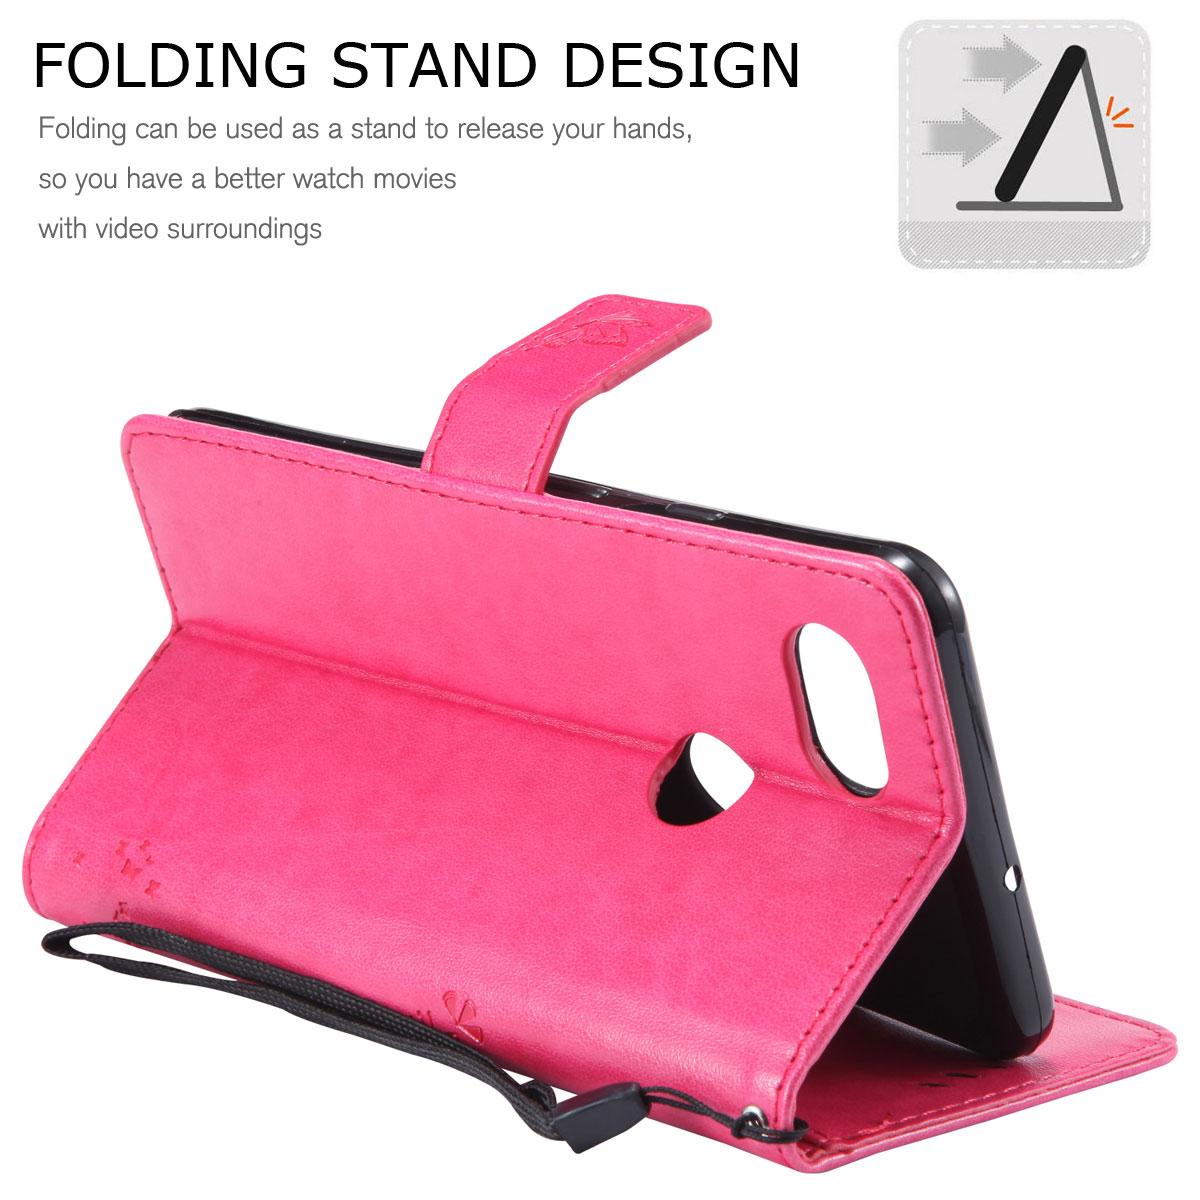 Magnetic-Leather-Credit-Card-Holder-Flip-Case-Cover-For-Google-Pixel-2-2-XL thumbnail 43